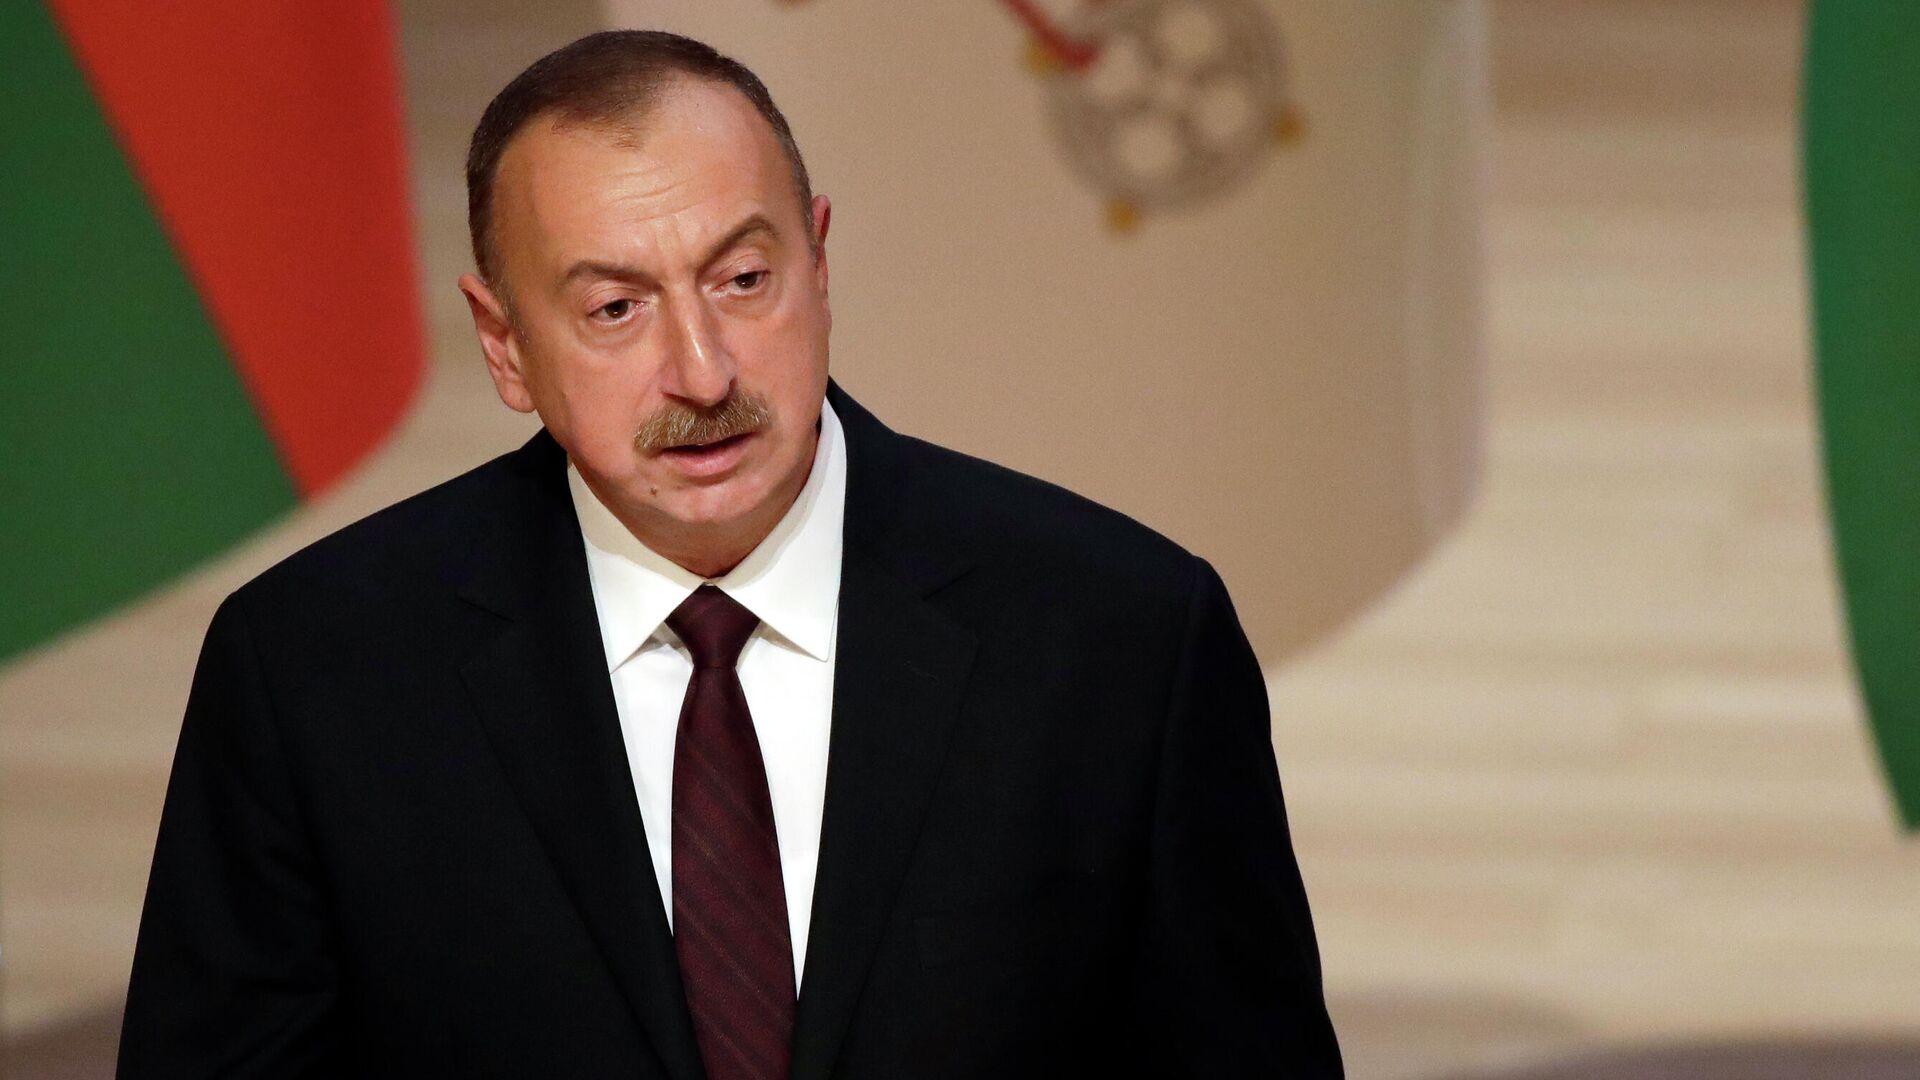 Президент Азербайджана Ильхам Алиев - РИА Новости, 1920, 18.10.2020